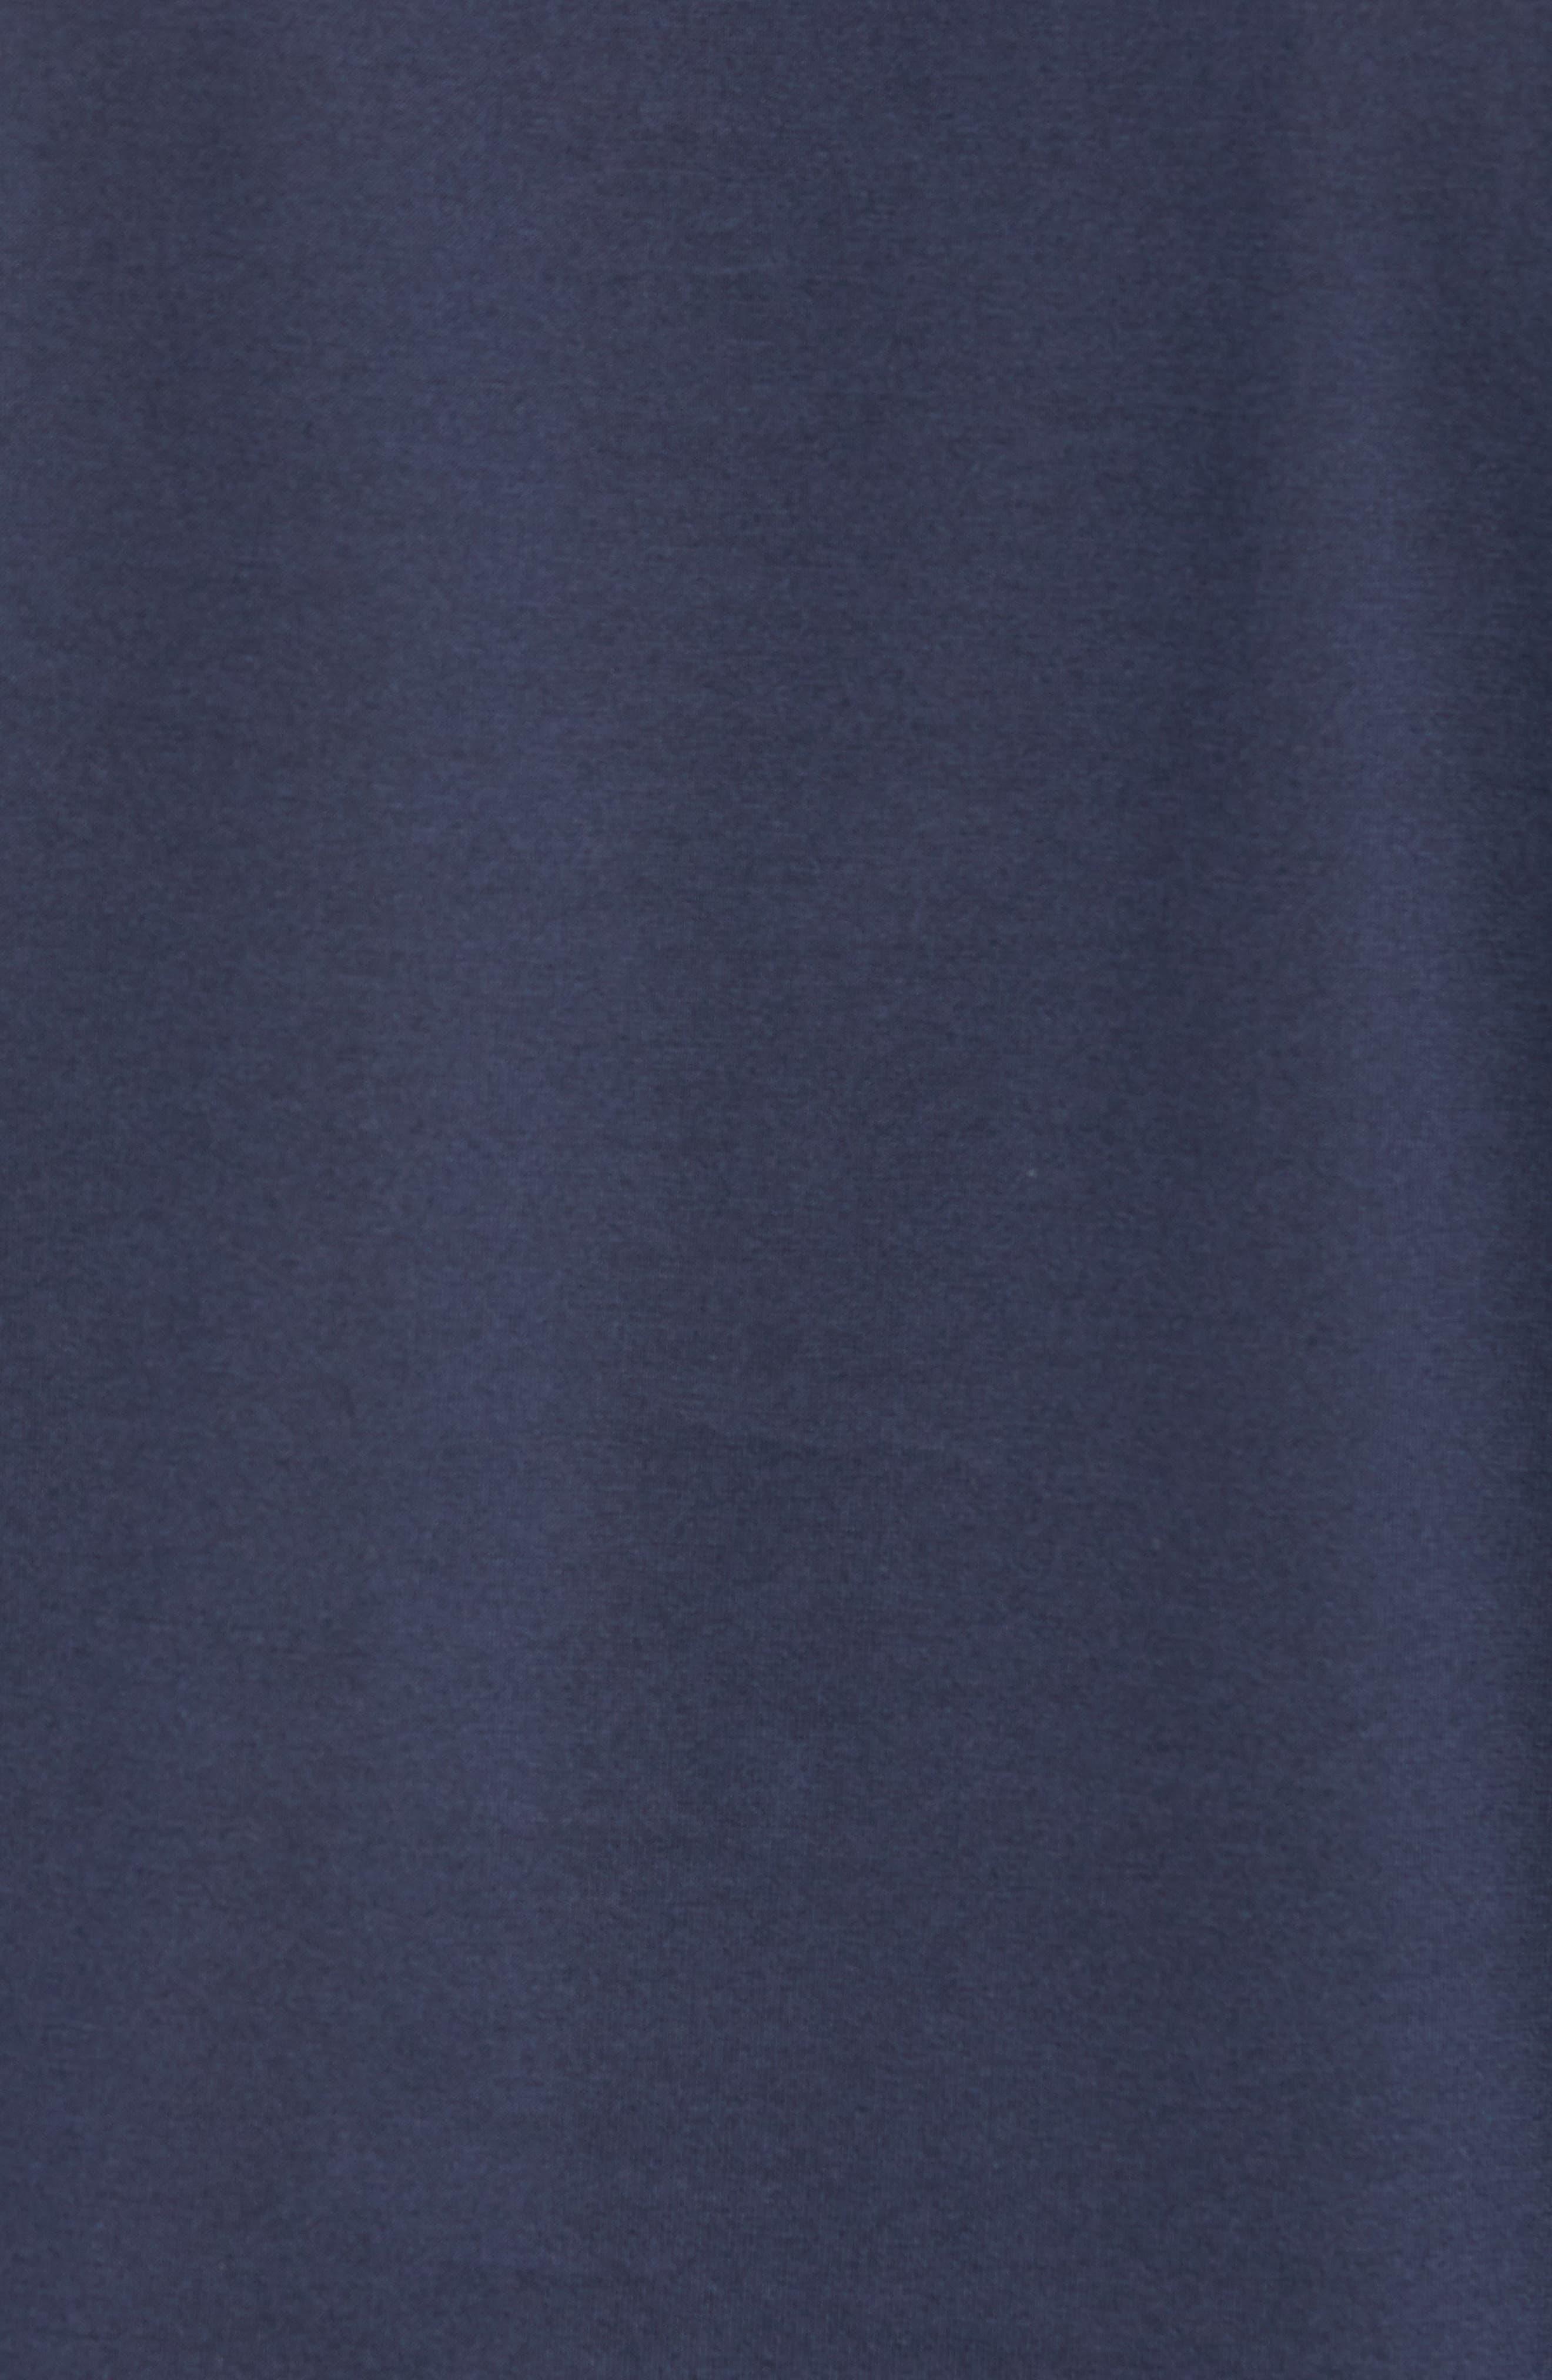 Dalendar Mercerized Cotton Slim Fit Polo Shirt,                             Alternate thumbnail 5, color,                             BLUE